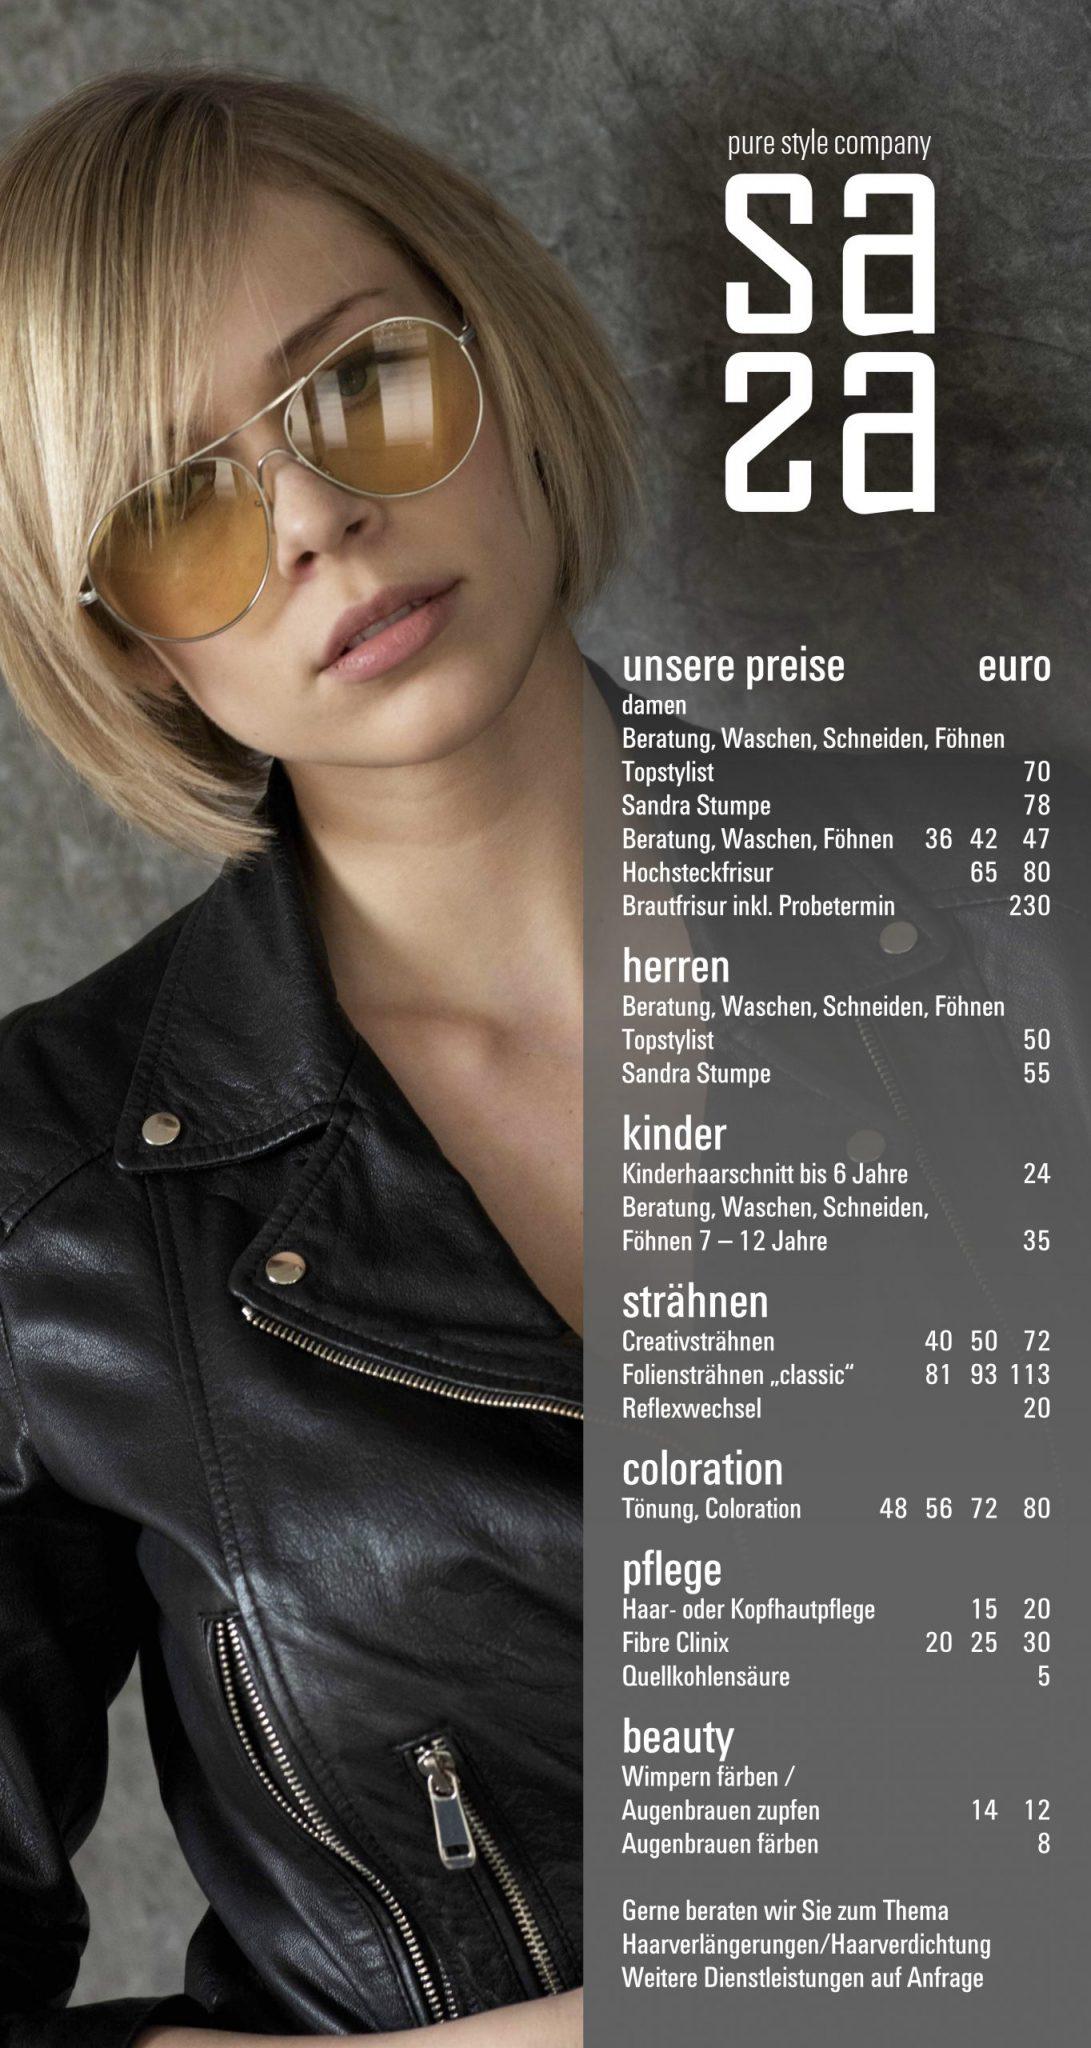 Sasa Pure Style Herrsching Preisliste